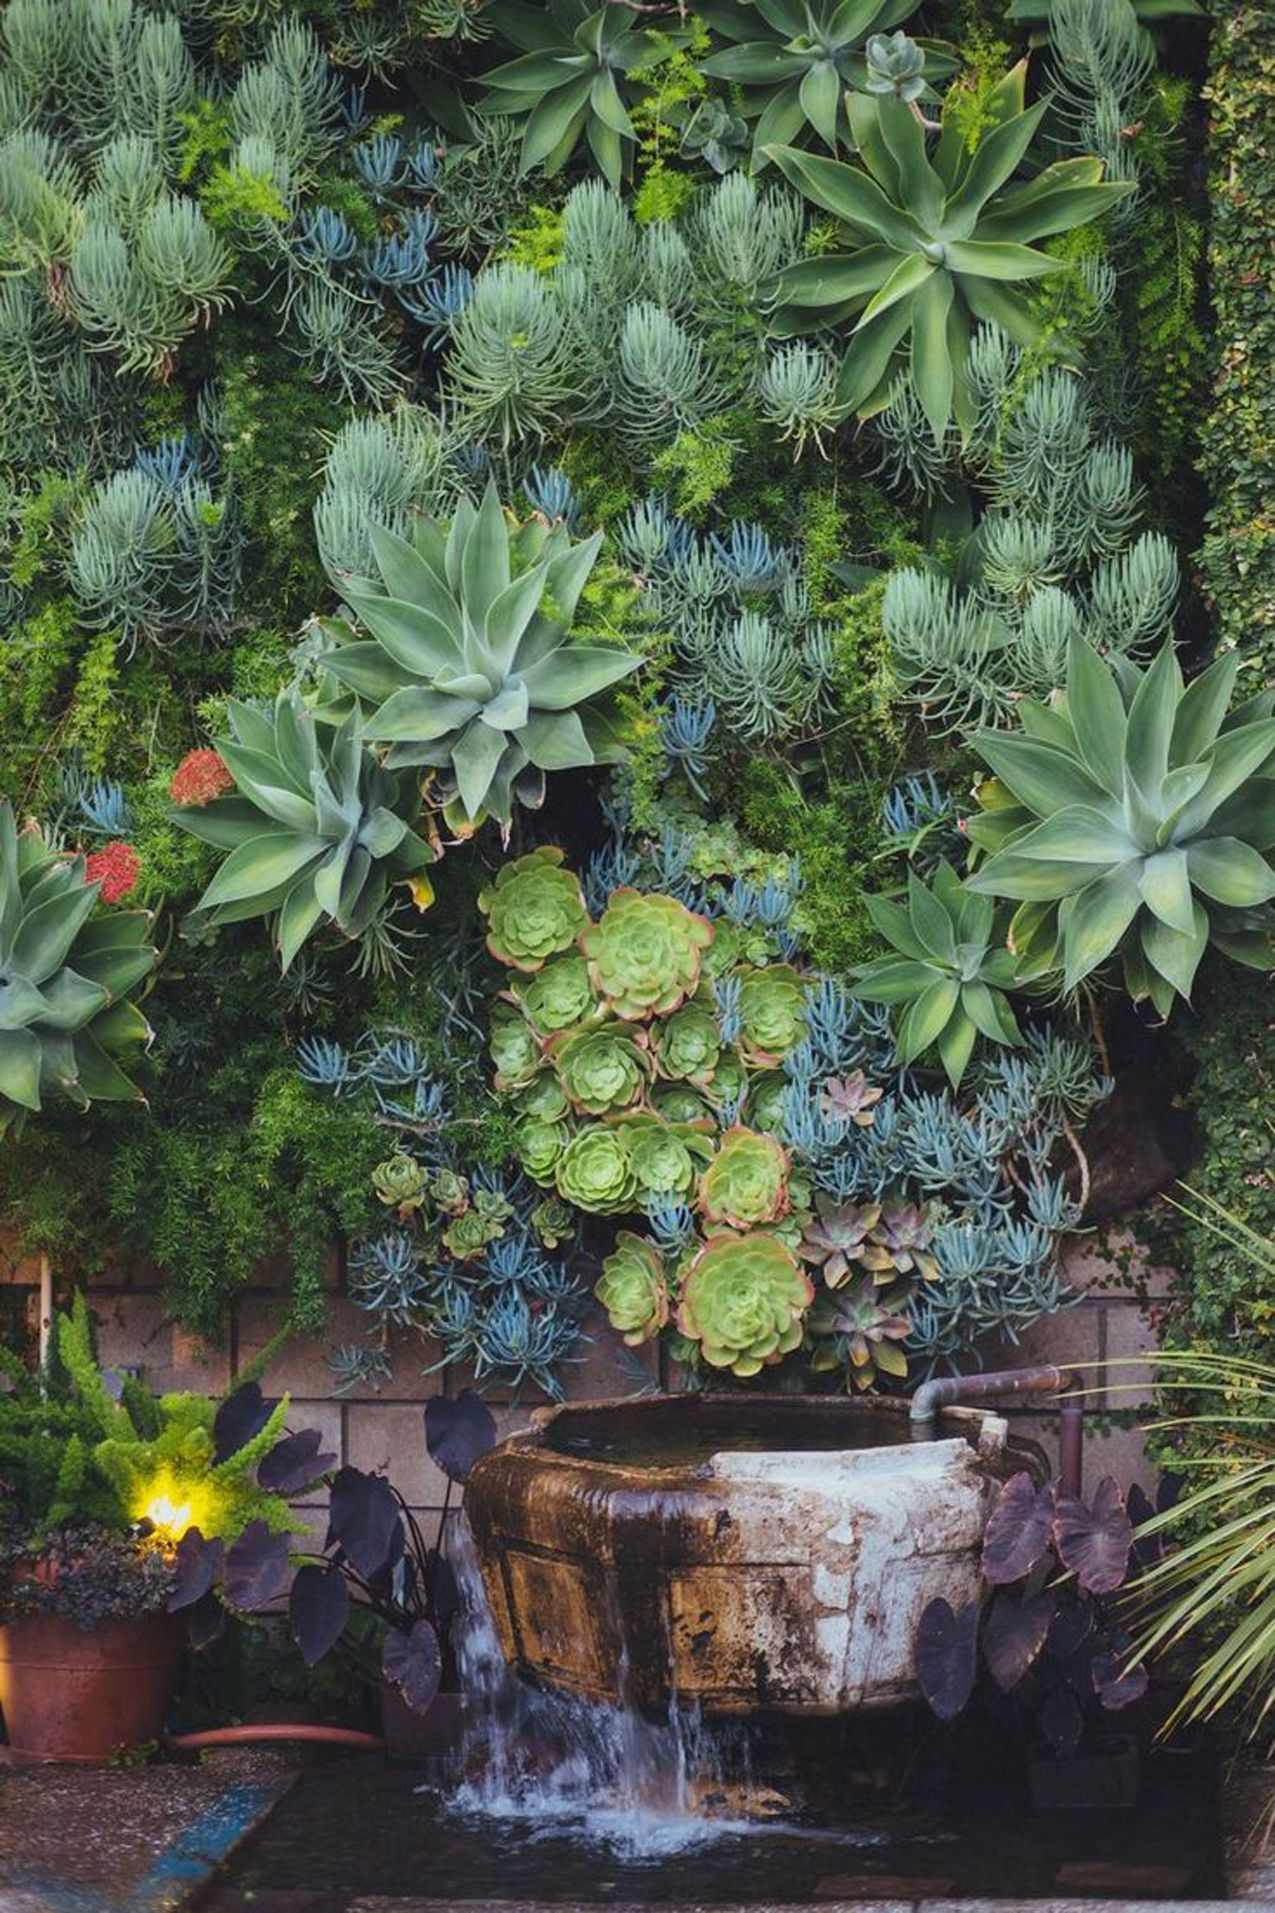 woolly holman diy artificial gardens hanging beau planter on indoor vertical garden wall diy id=44015